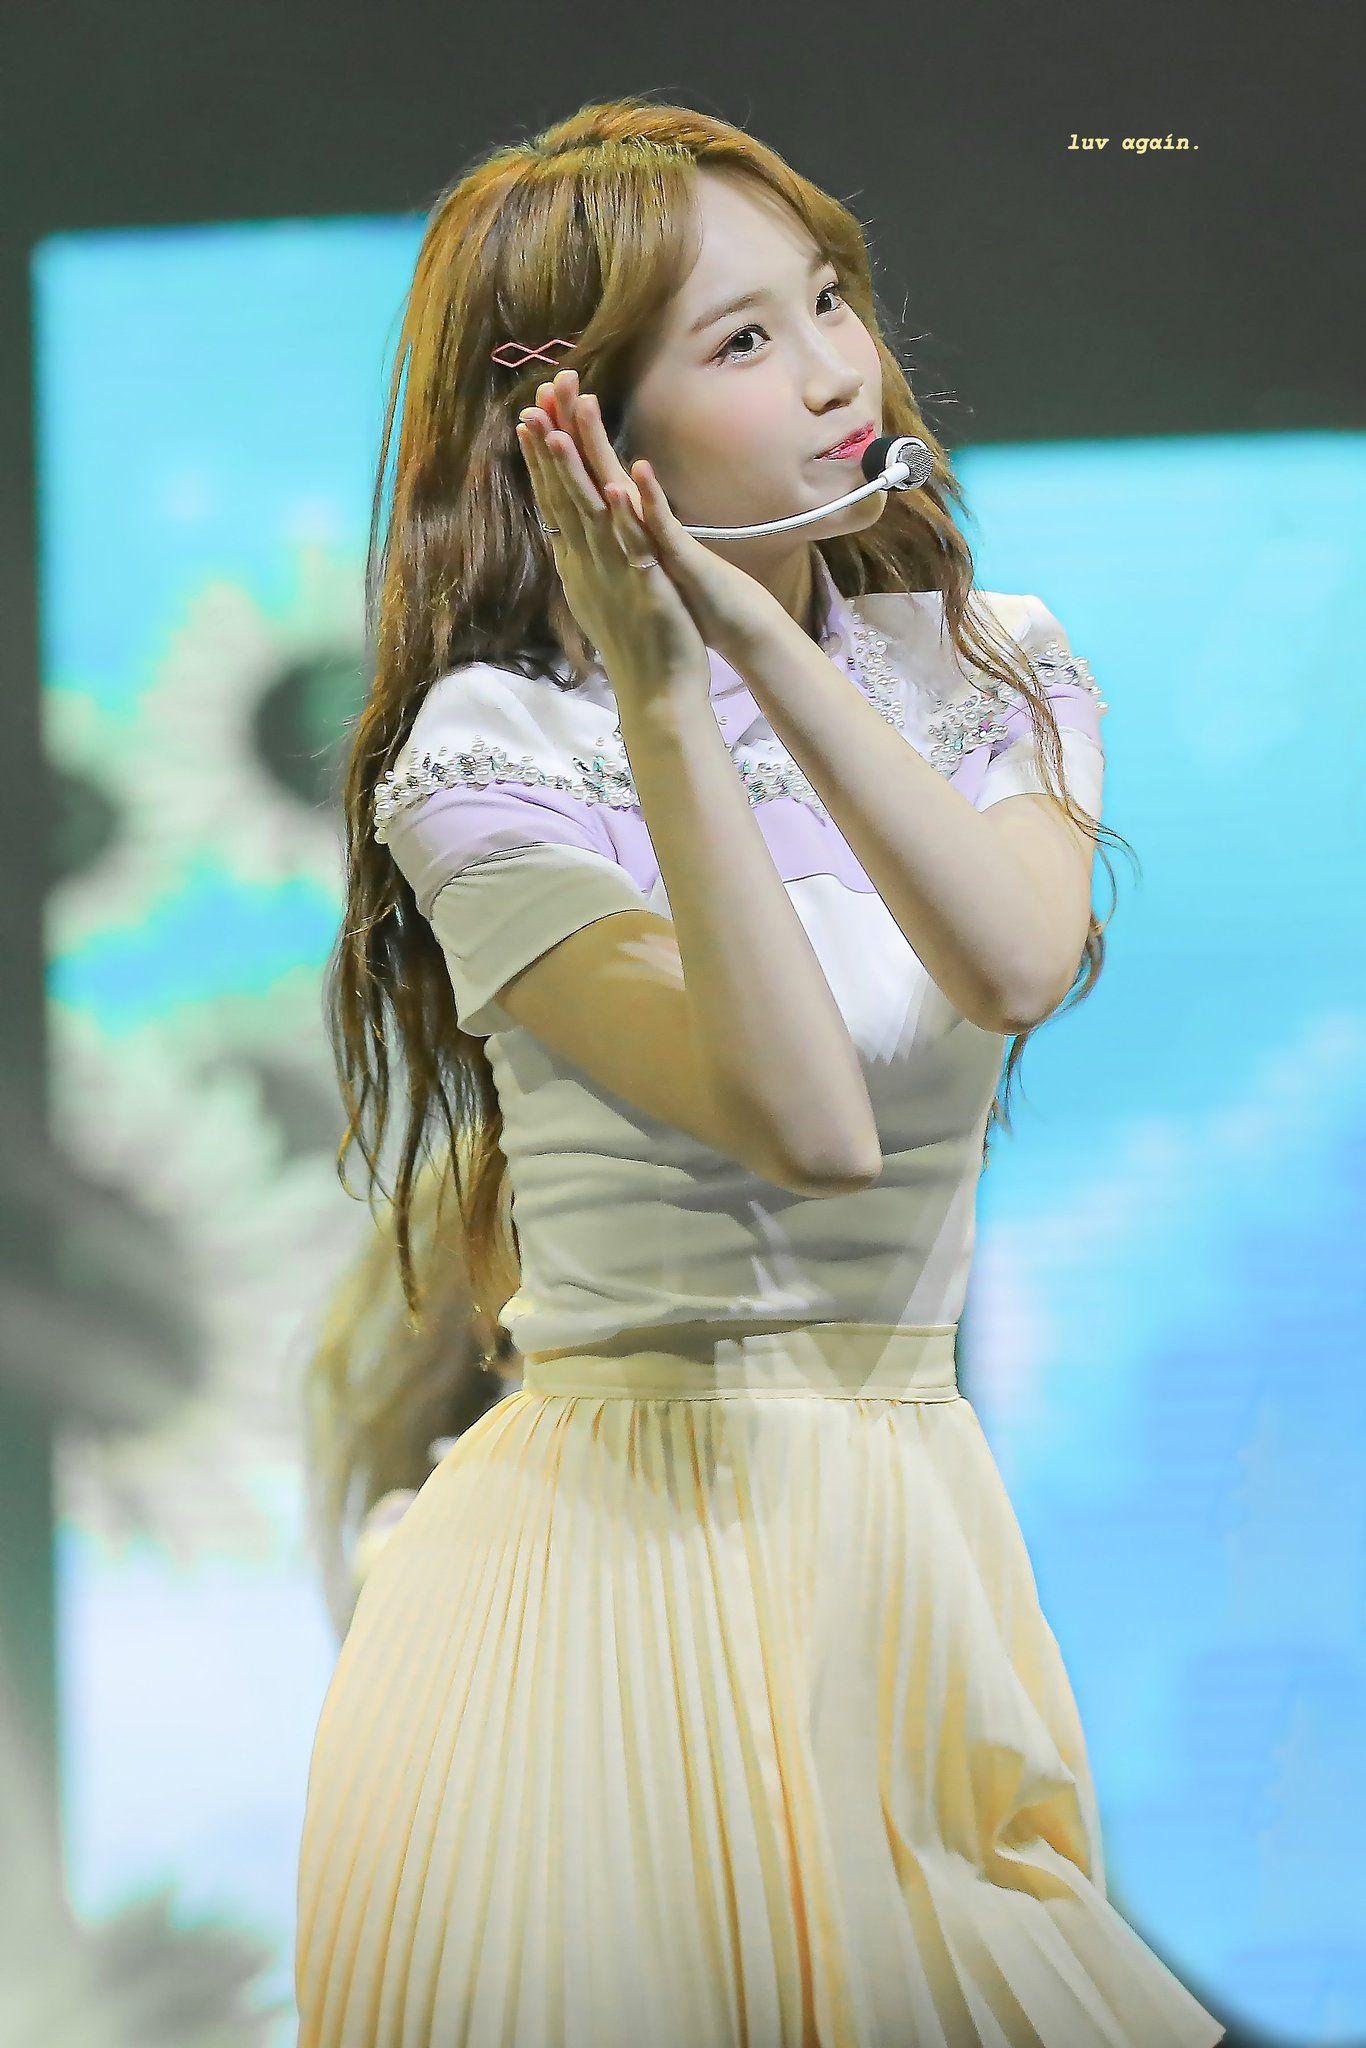 Luv Again On Twitter Kim Kpop Idol Thailand